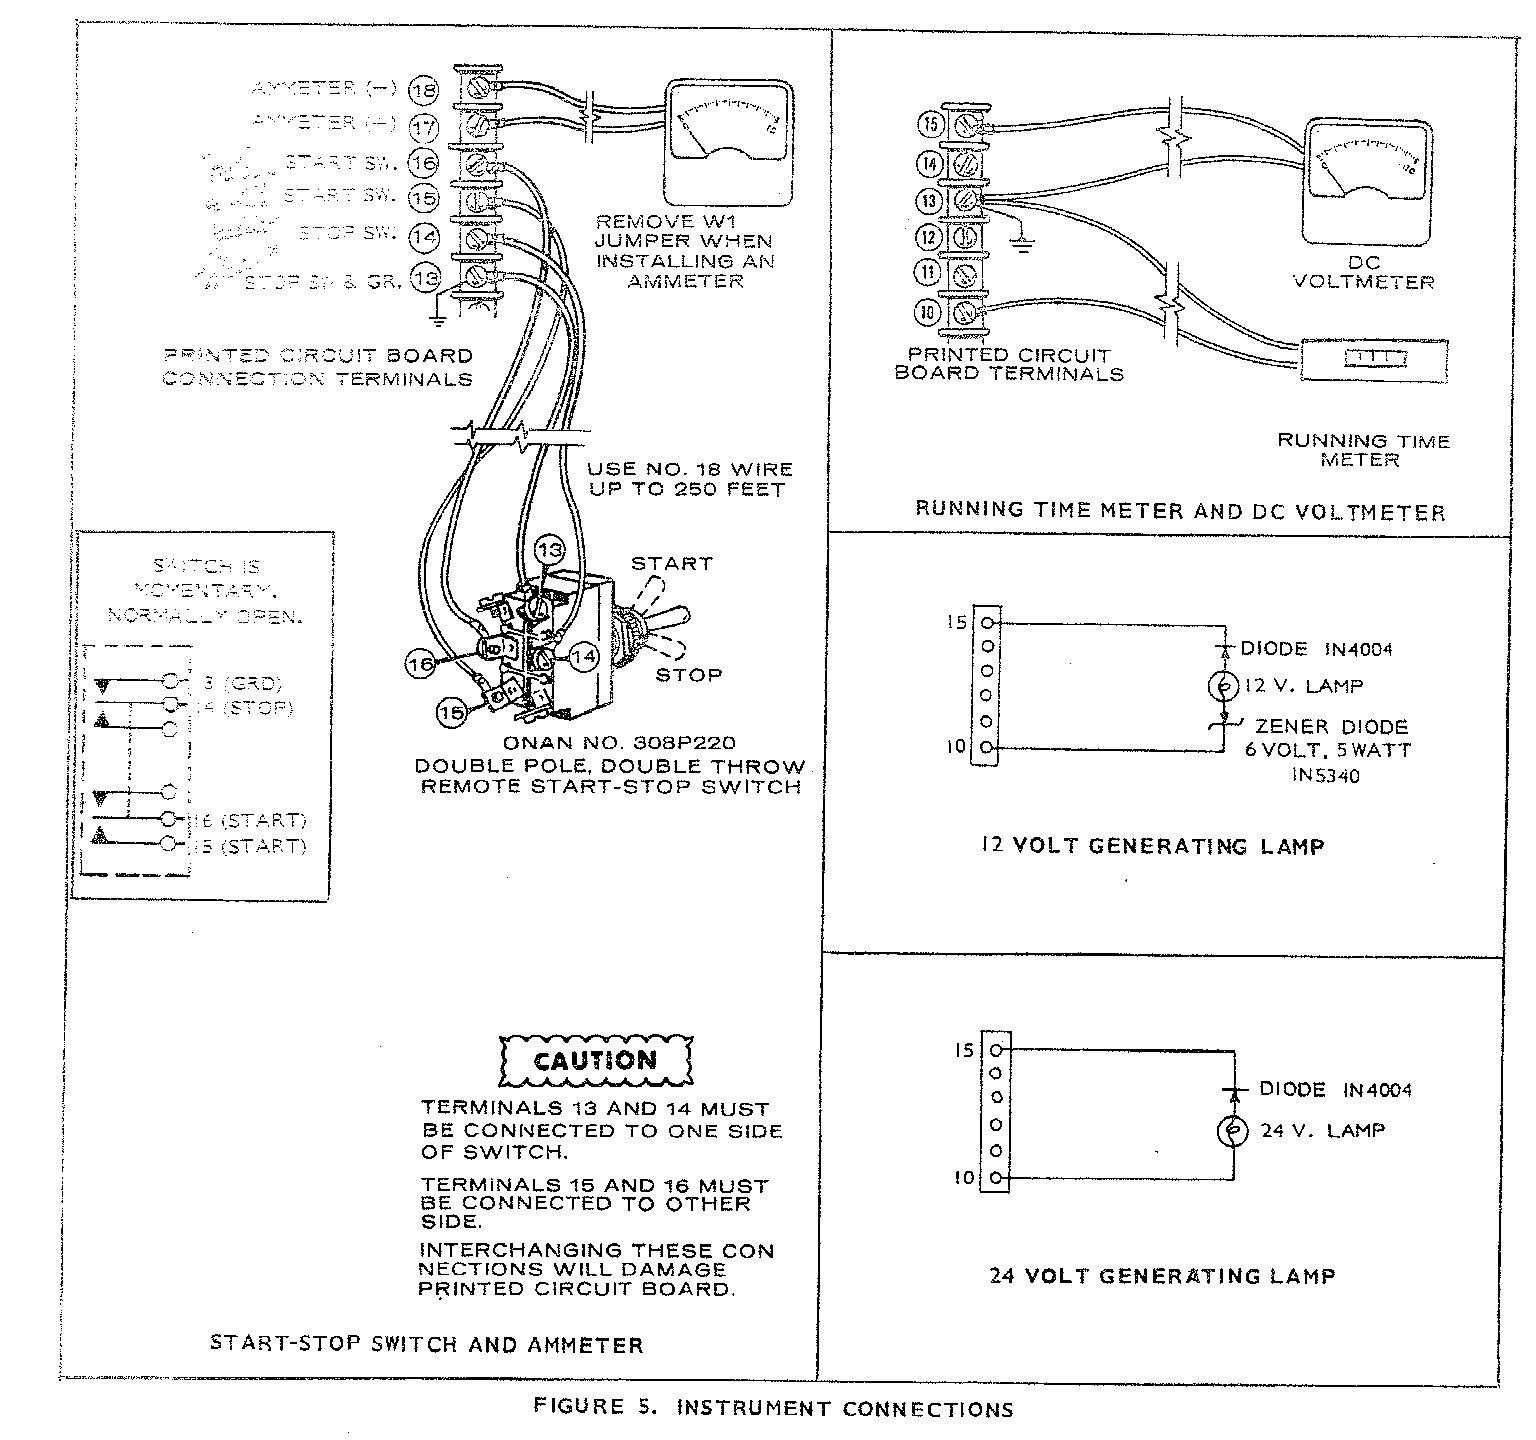 DIAGRAM] Onan Rv Generator Remote Wiring Diagram FULL Version HD Quality Wiring  Diagram - SEADOOWIRINGPDF.EVALINKA.FRevalinka